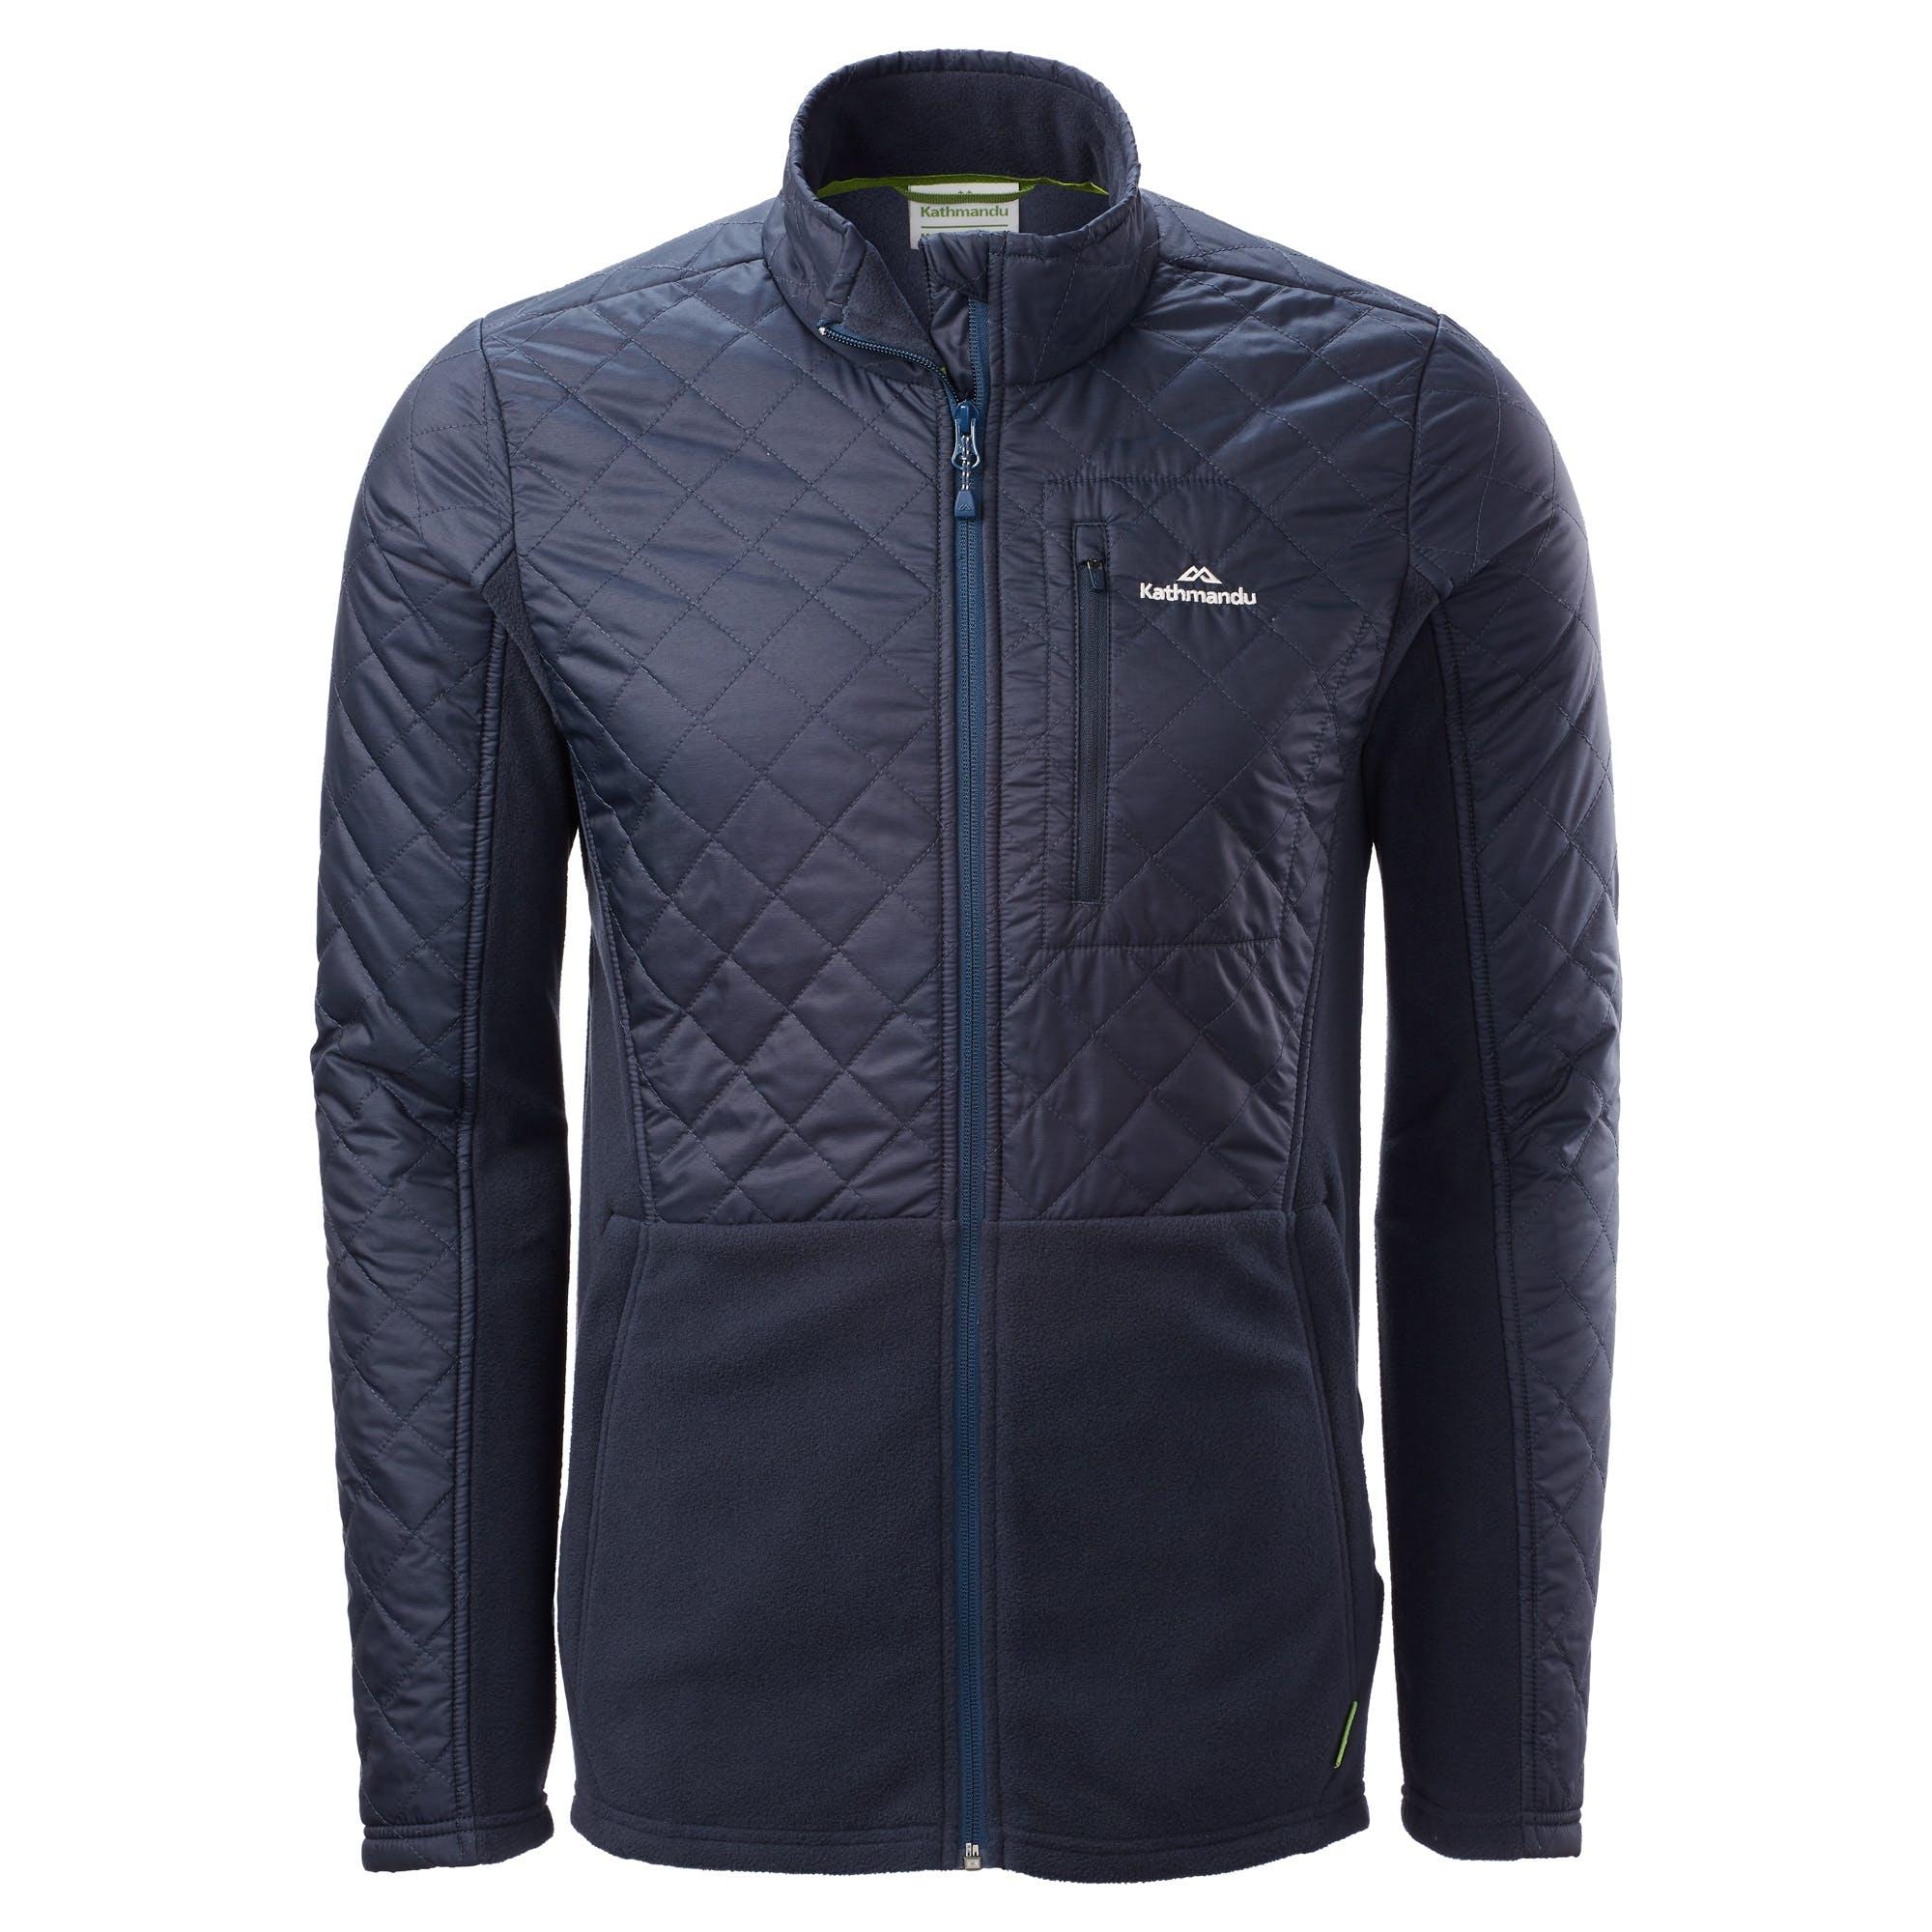 Kathmandu Fleece-Jacke Forerunner | Bekleidung > Jacken > Fleecejacken | Blau | Fleece - Polyester | Kathmandu